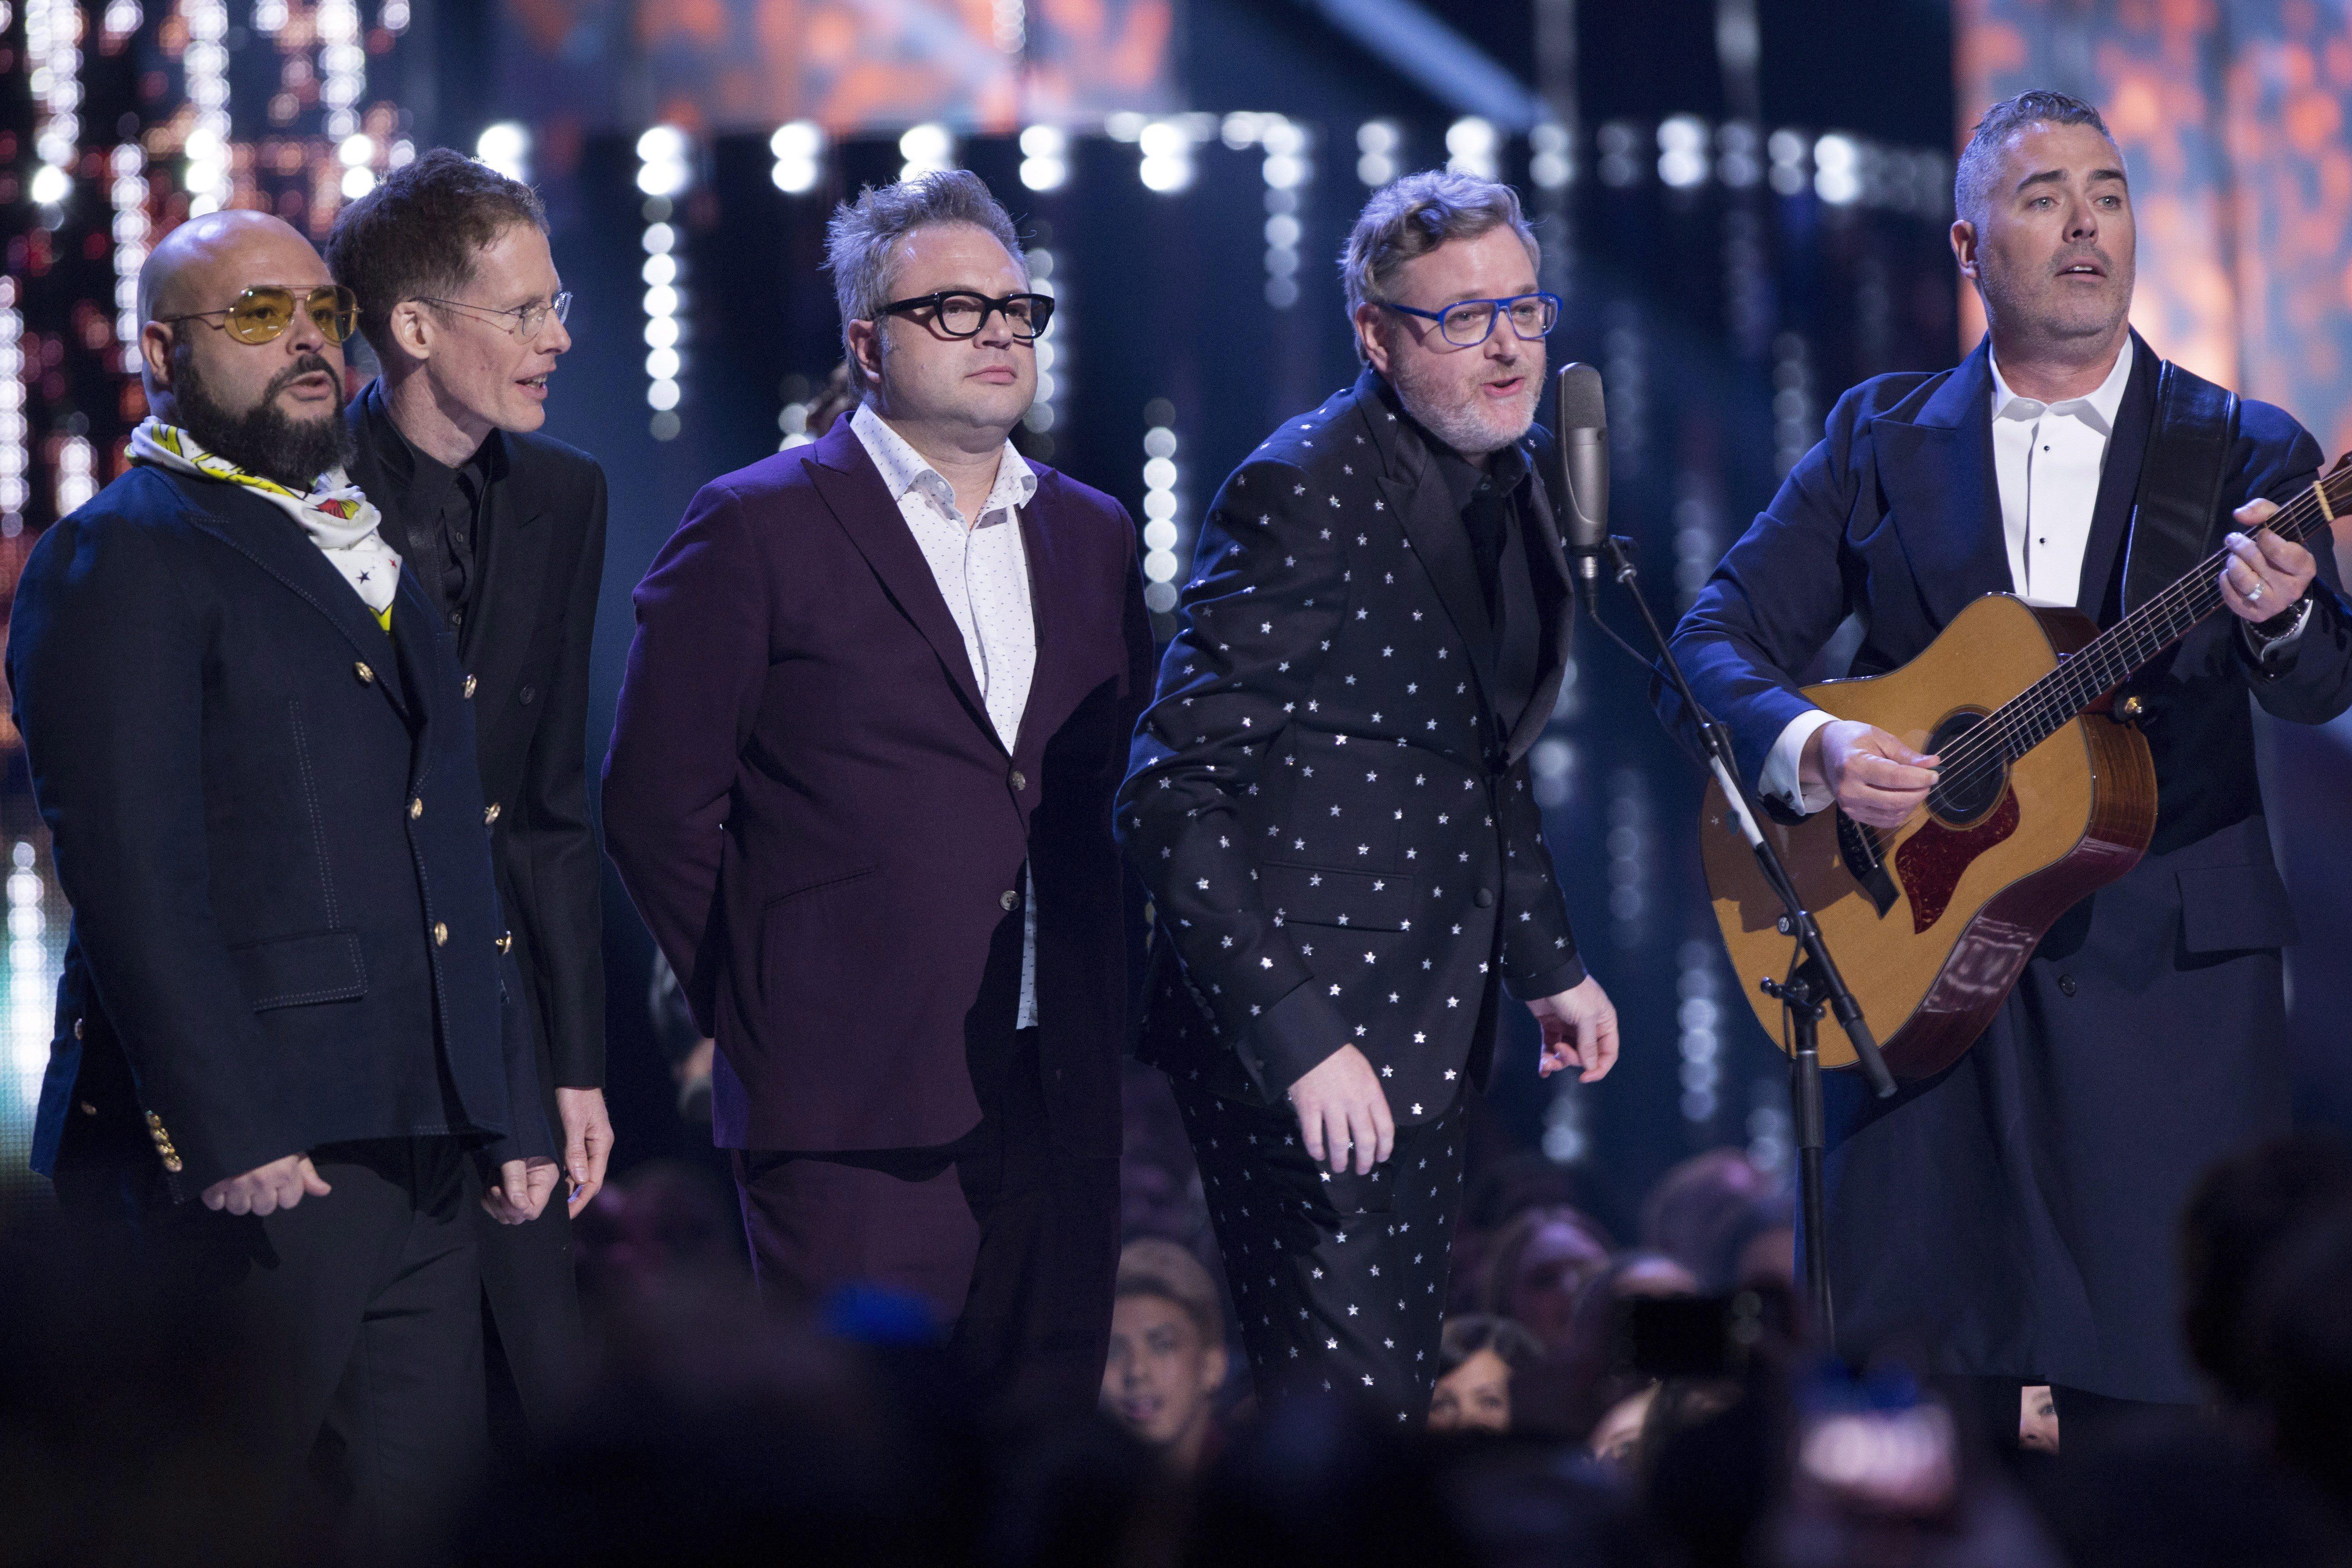 Arcade Fire, Shawn Mendes Win Big at Canada's Juno Awards